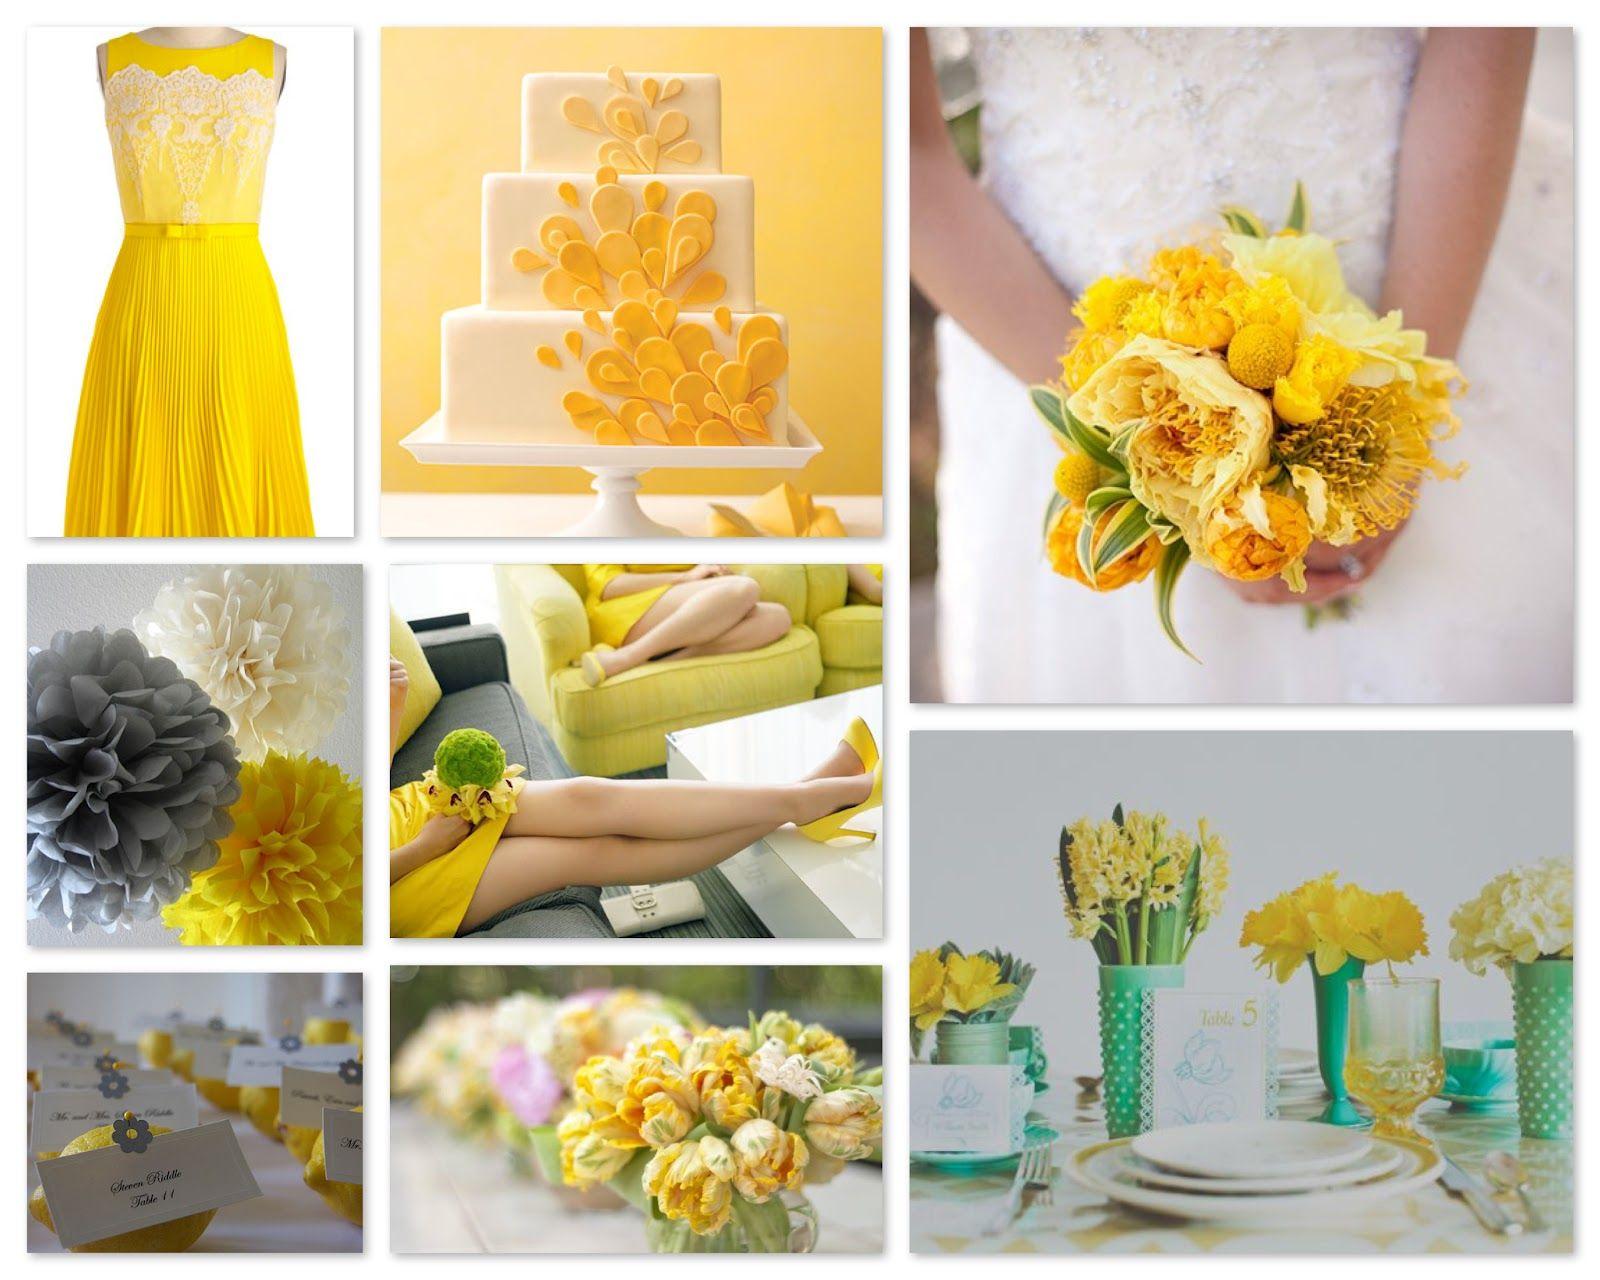 spring wedding 2013 color lemon zest pantone 13 0756 more